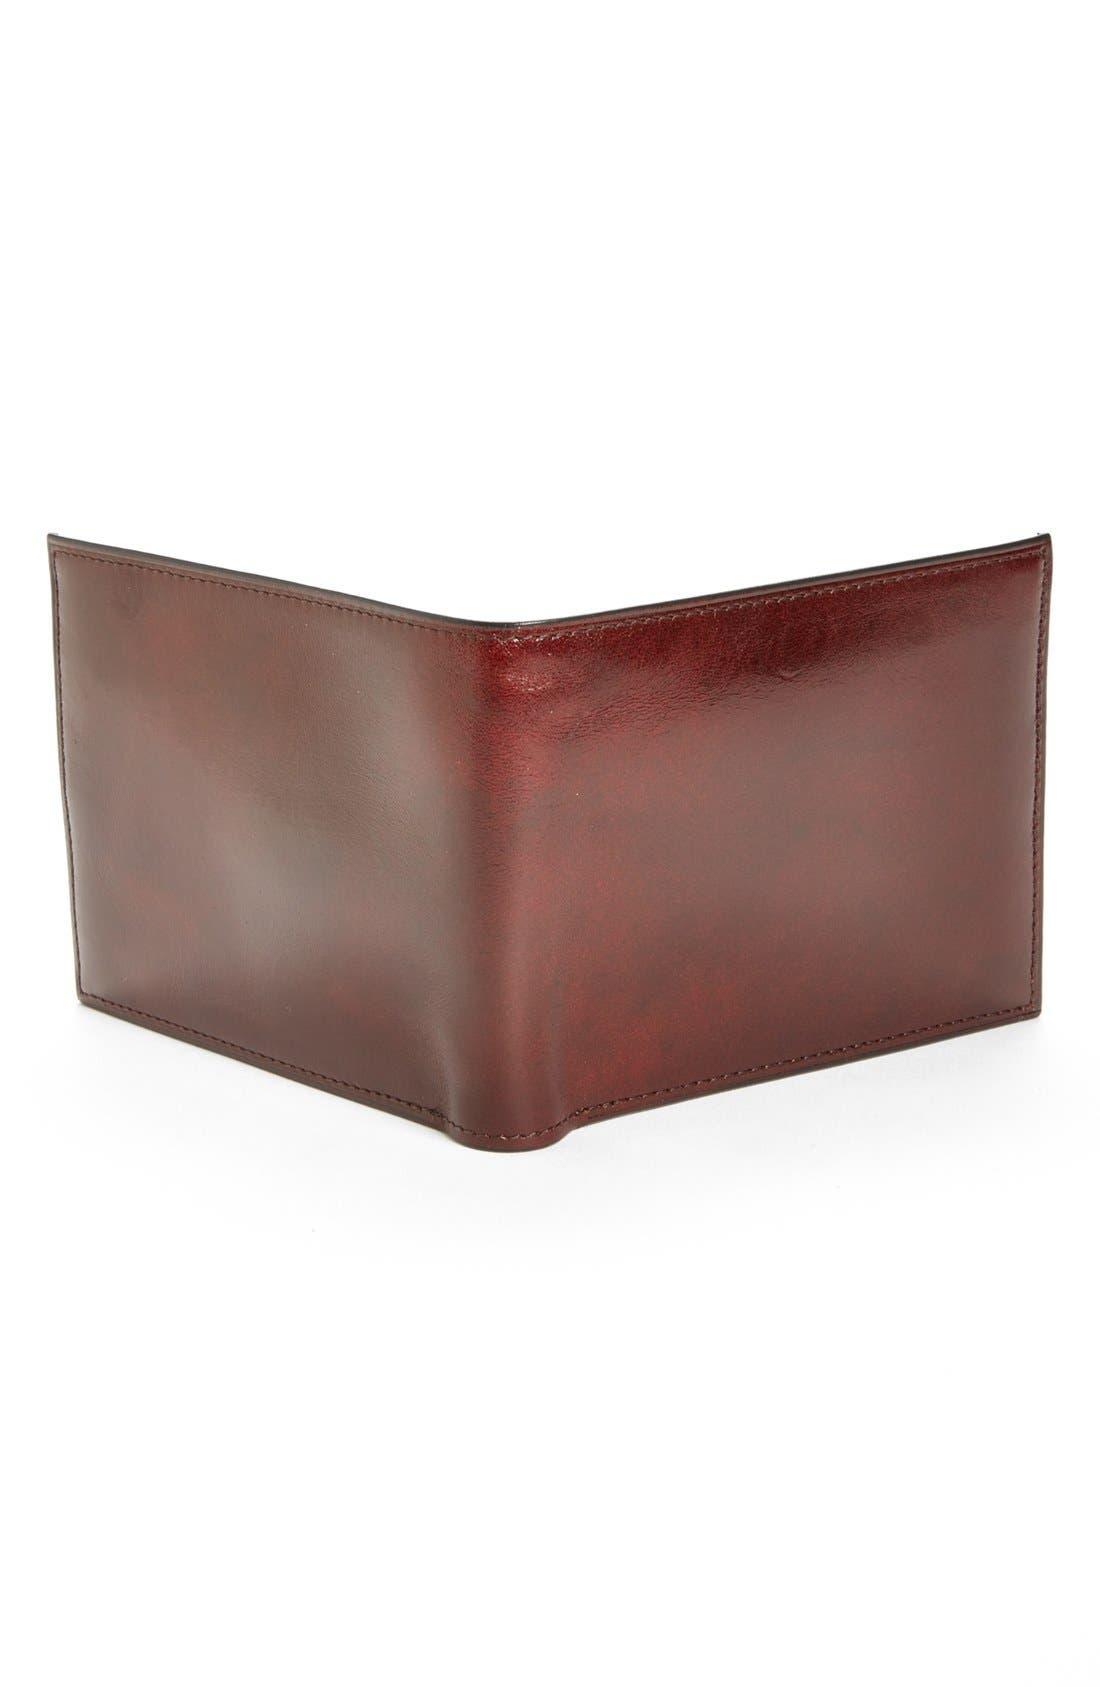 Alternate Image 3  - Bosca ID Flap Leather Wallet